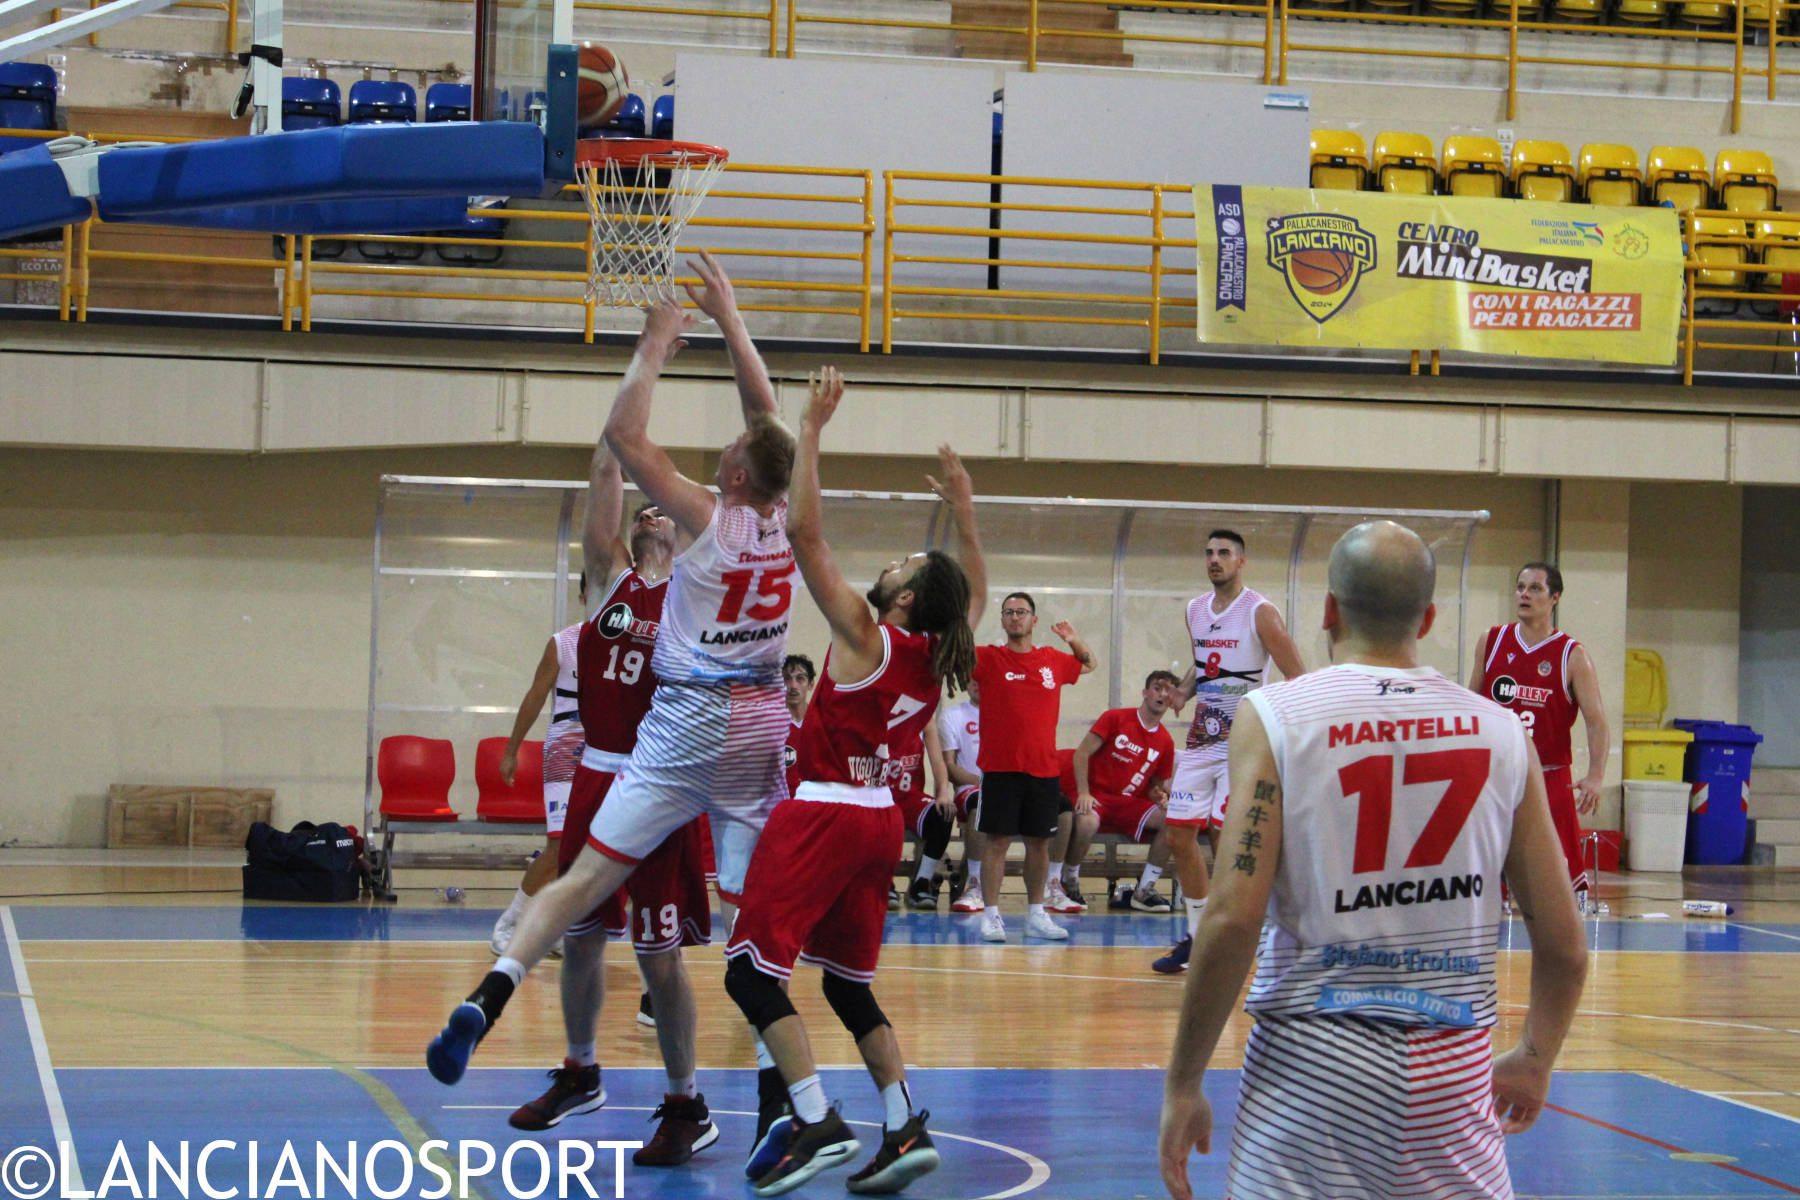 Unibasket Lanciano-Vigor Matelica 71-75